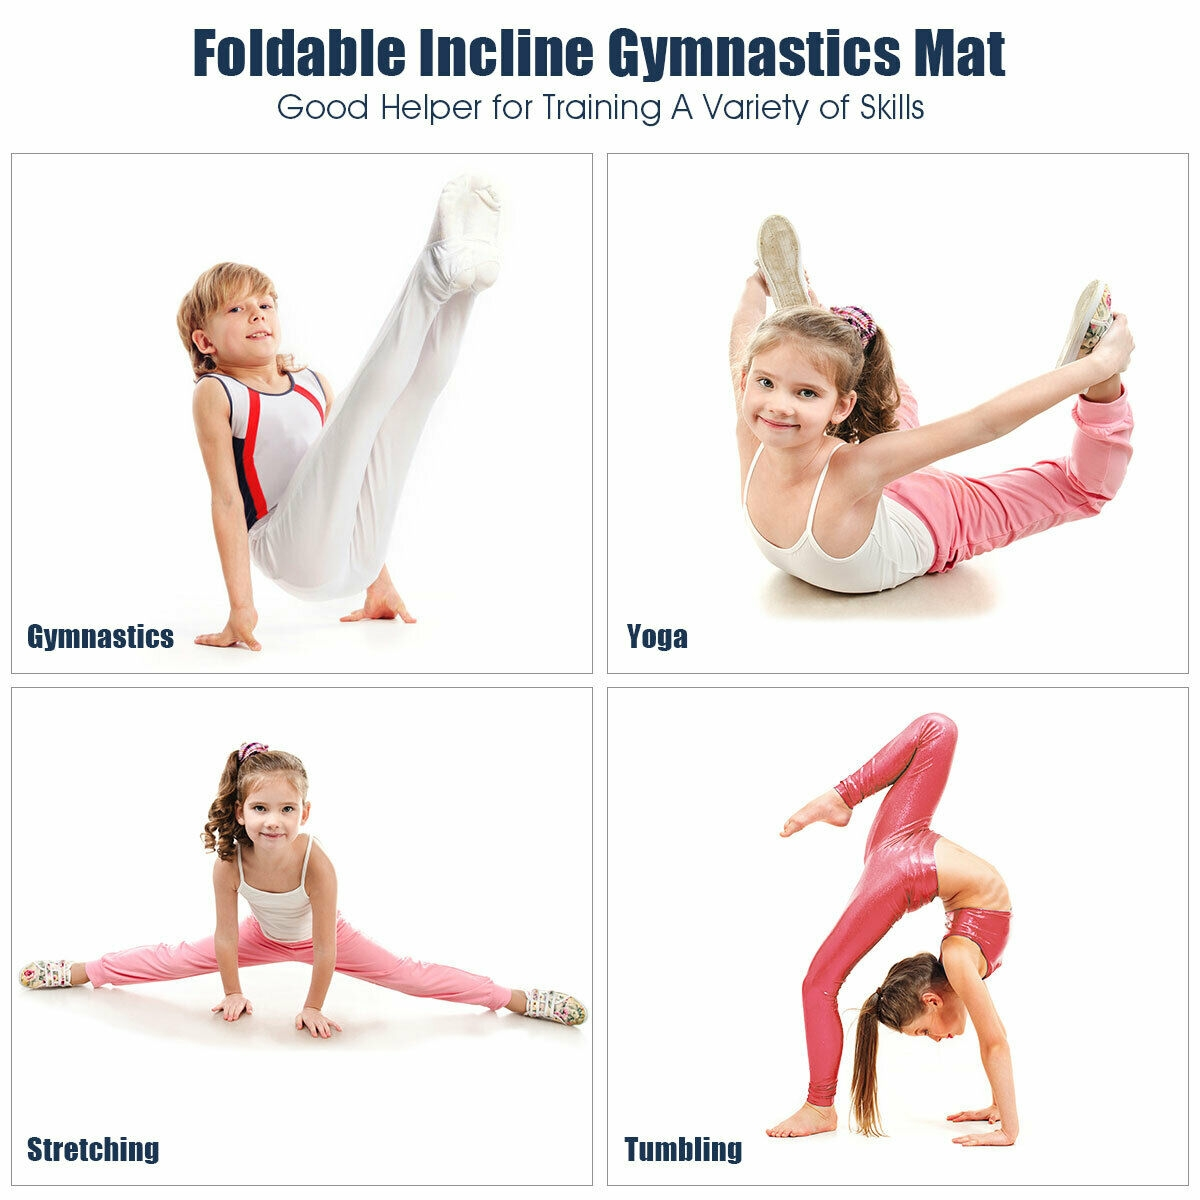 Incline Tumbling Wedge Ramp Gymnastics Mat